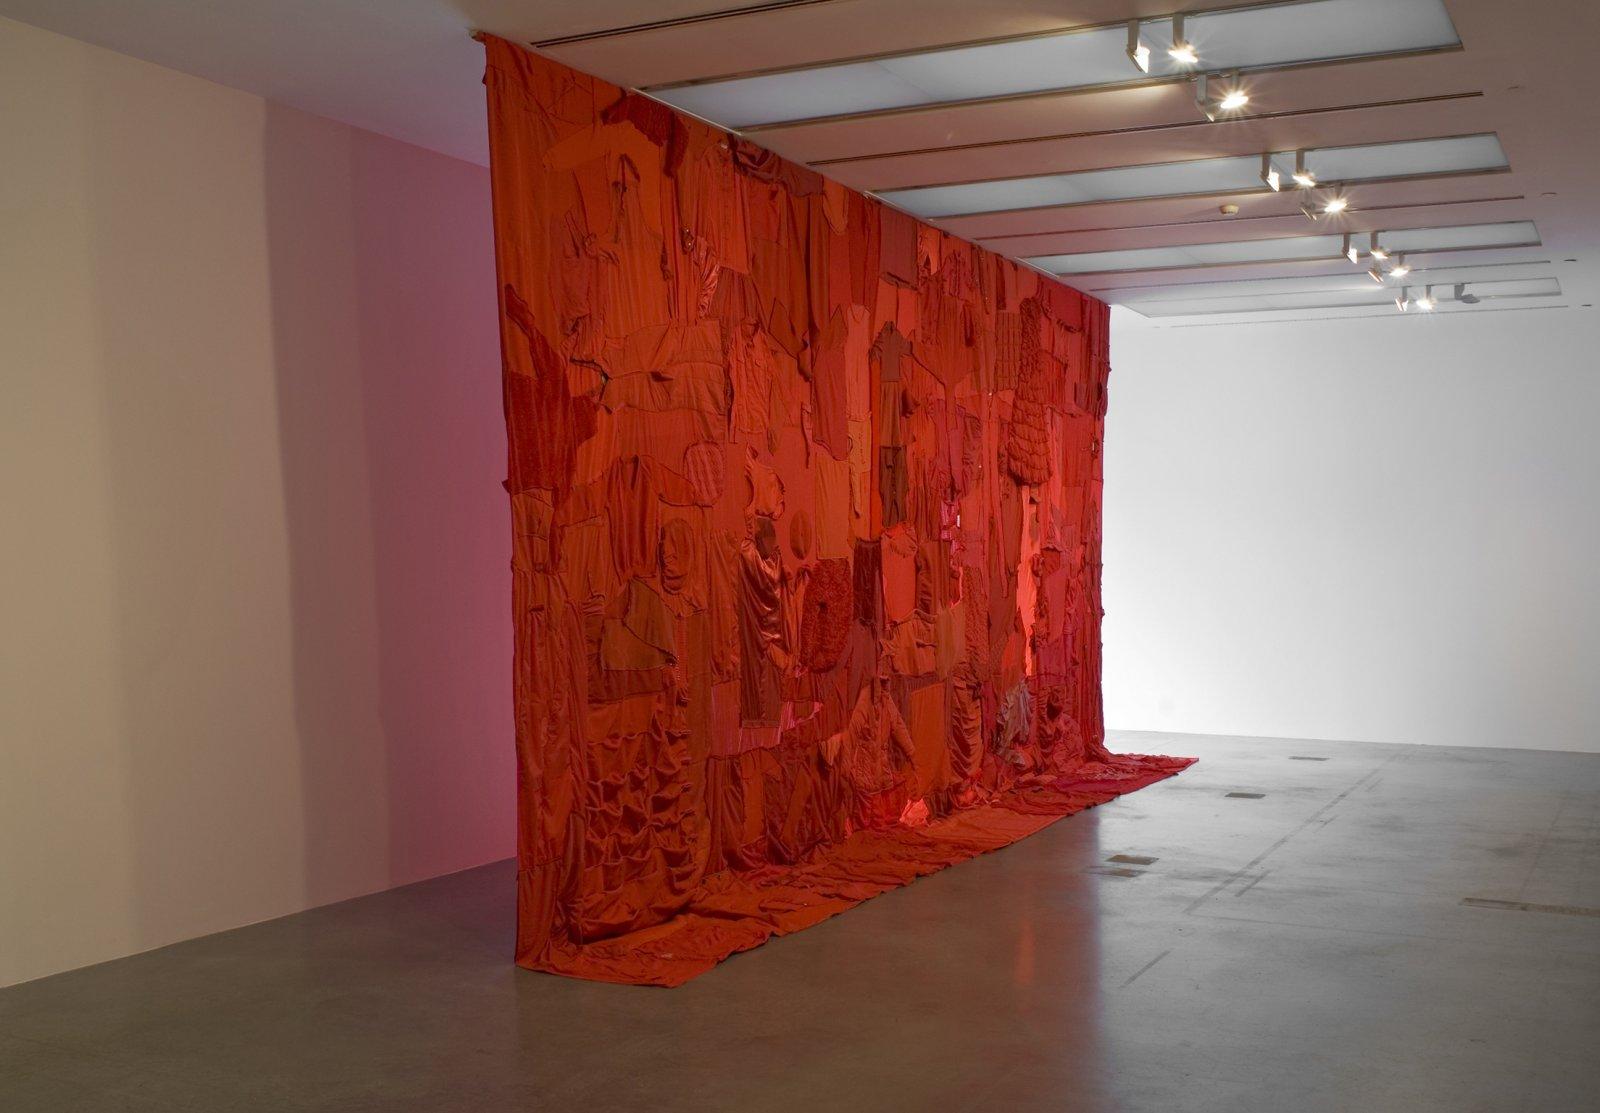 BrianJungen,People's Flag, 2006, textiles, 189 x 347 in. (480 x 880 cm)